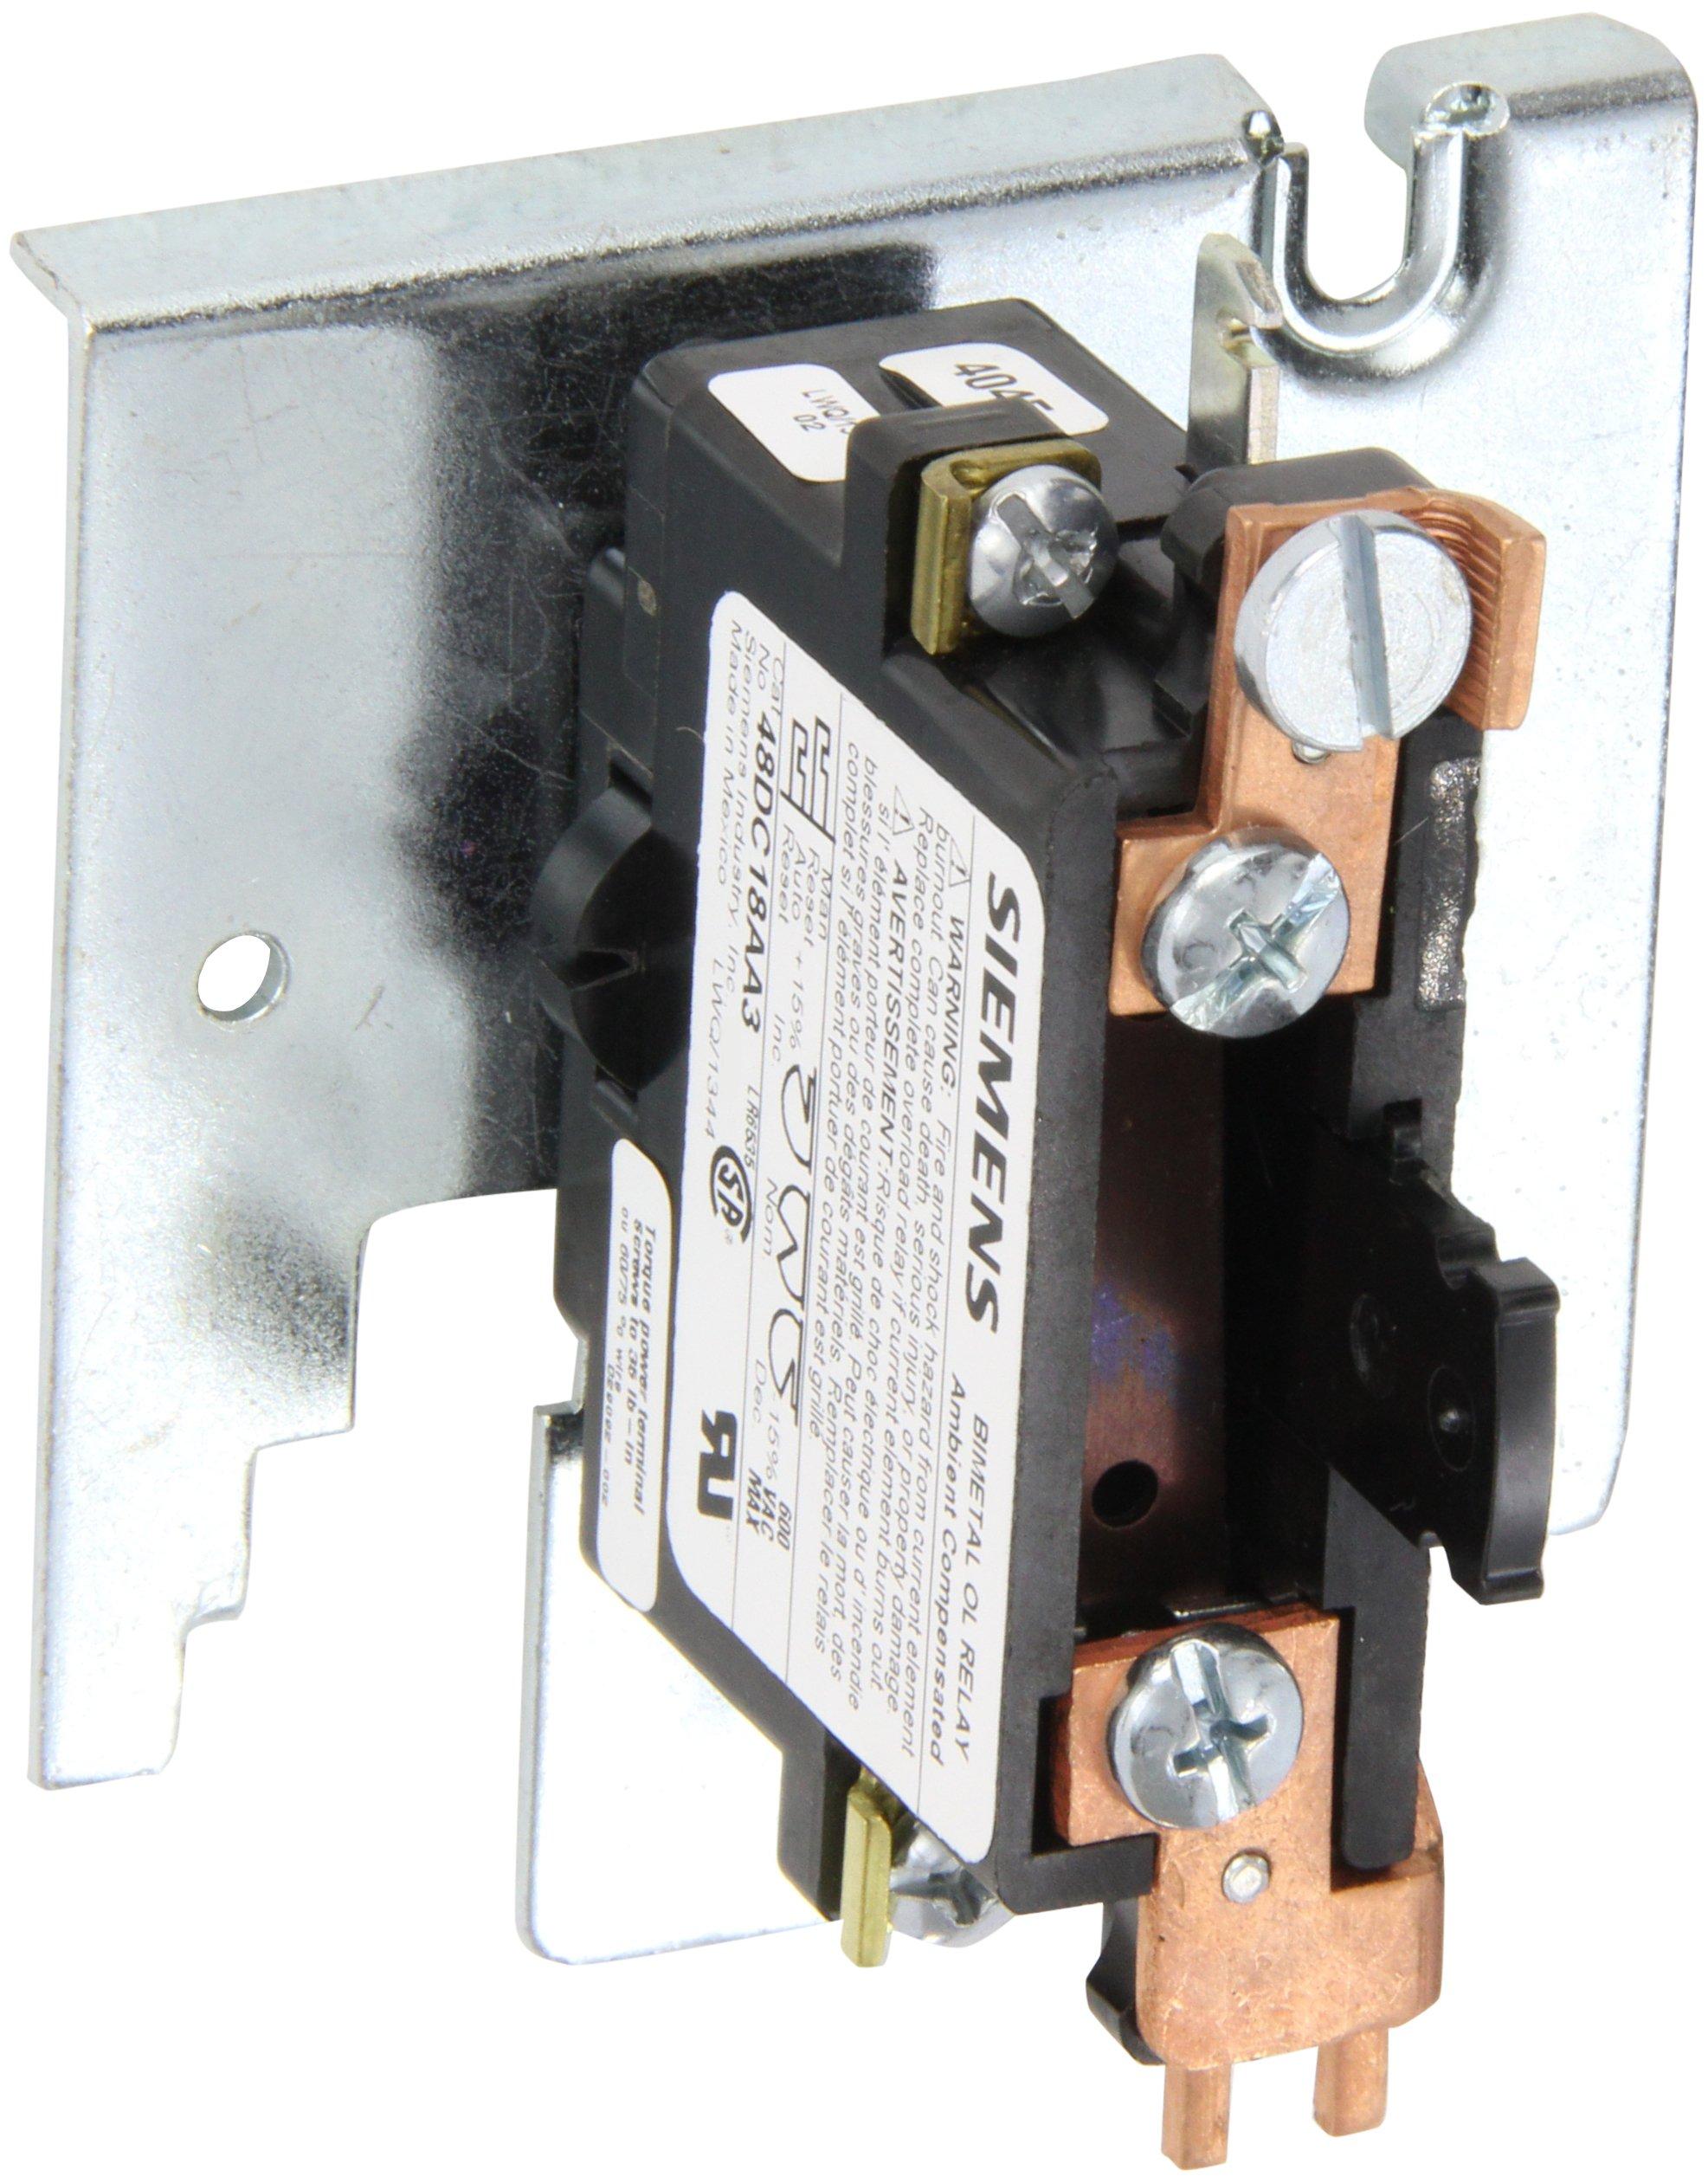 Siemens 48DC18AA3 Overload Relay, 1 NC Ambient Comp Bimetal, 00-1 Size, P Model, 1 Pole